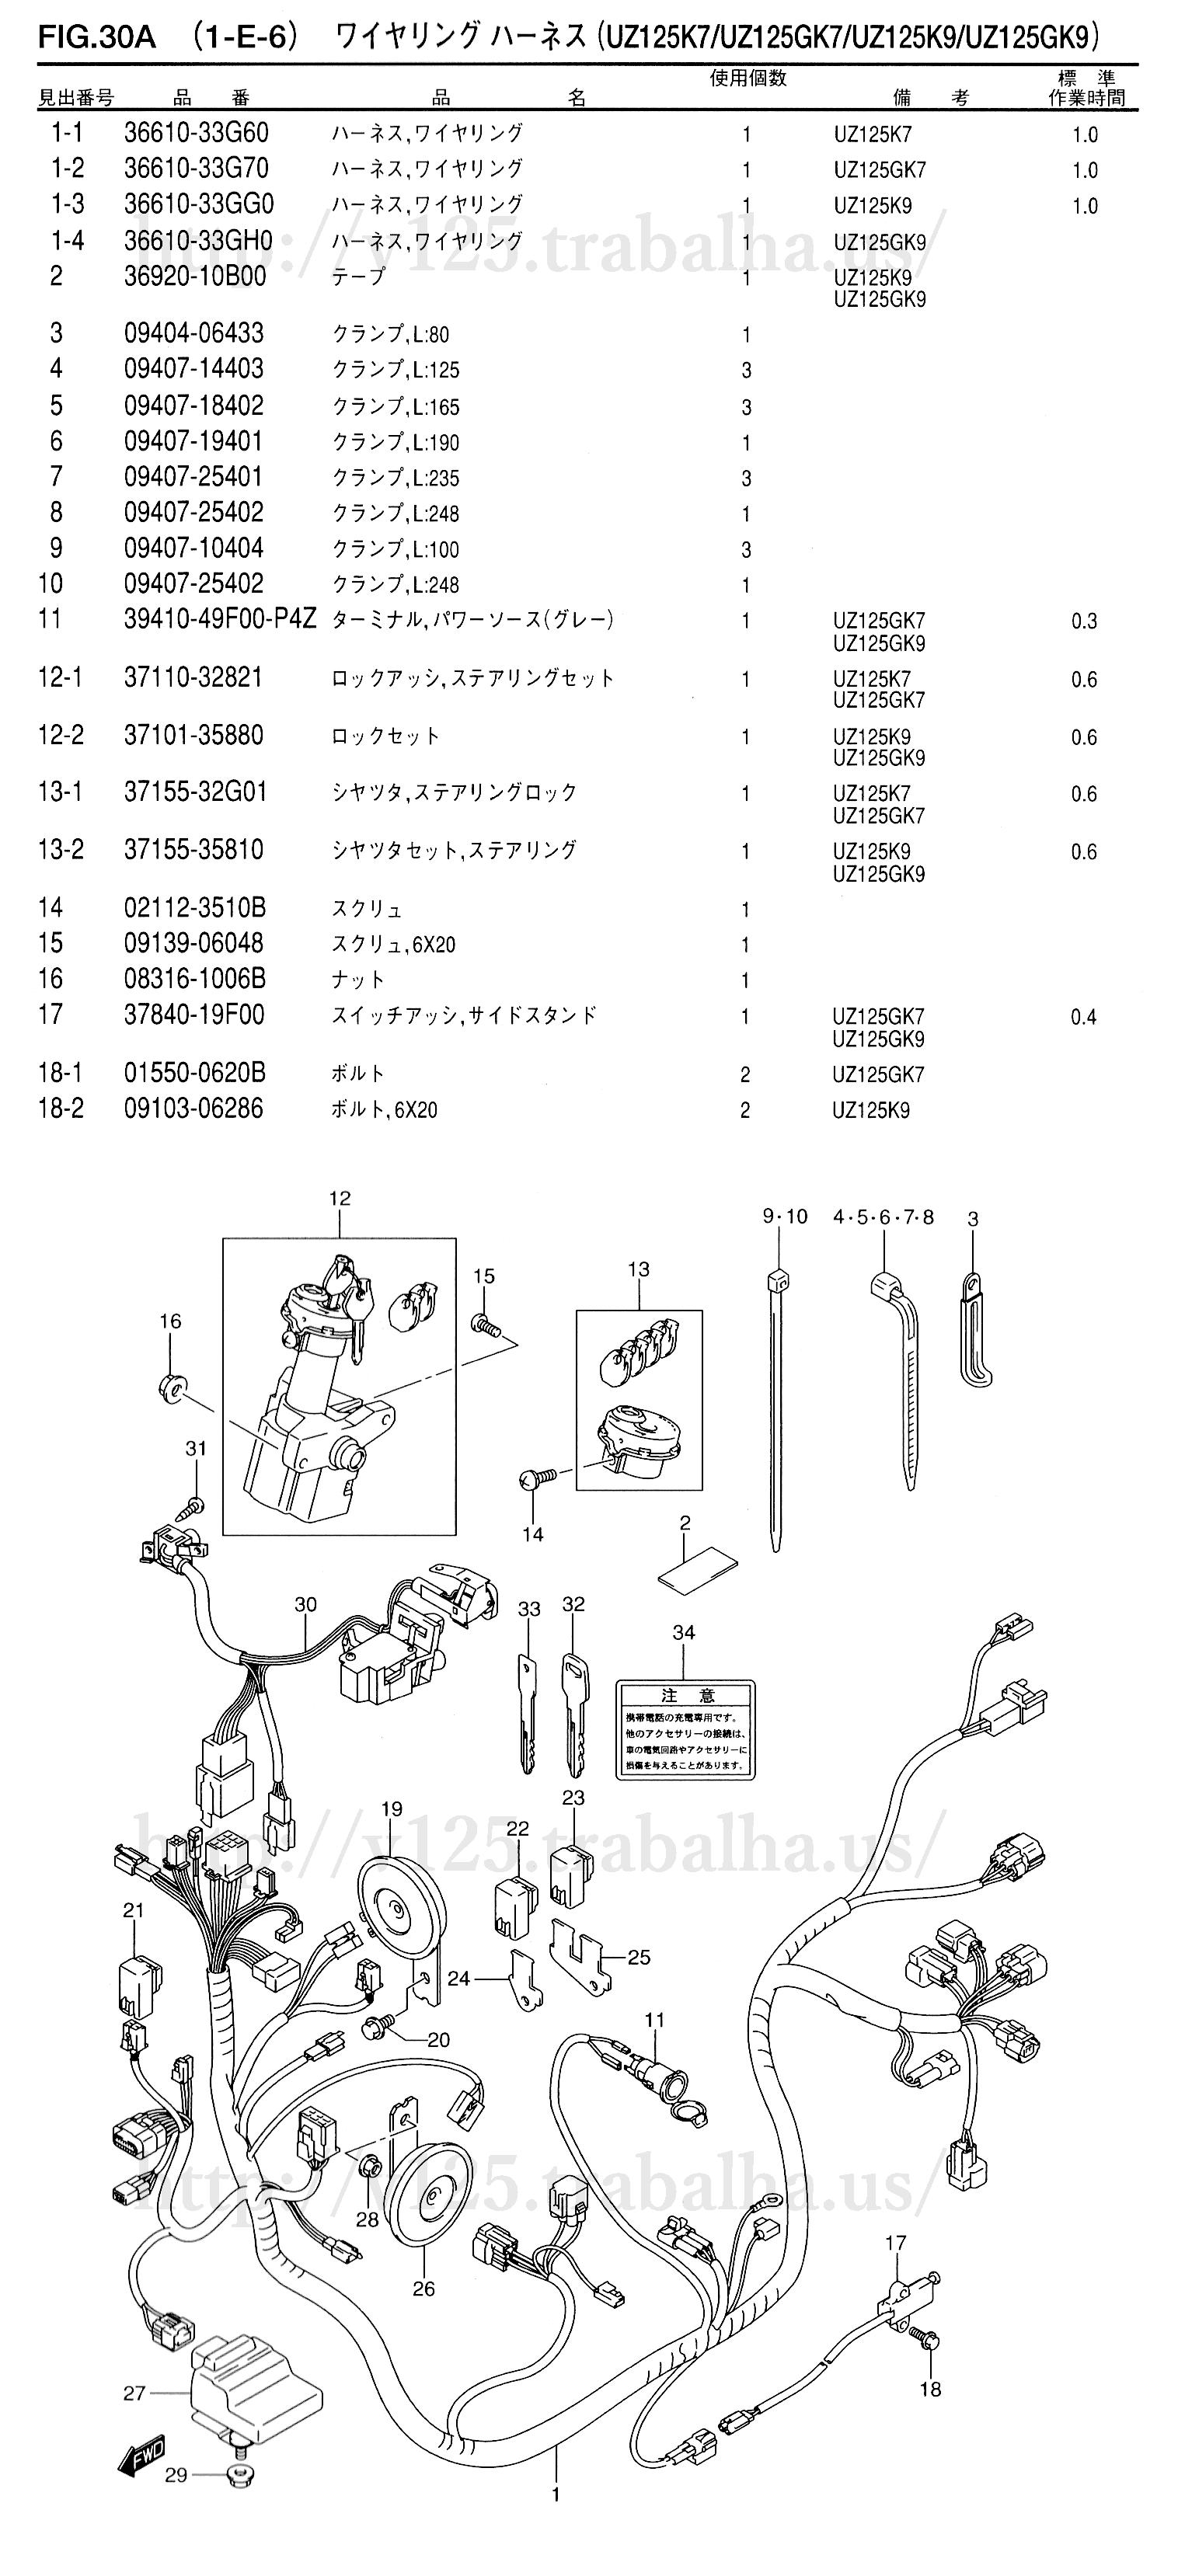 FIG.30A(1-E-6)ワイヤリング ハーネス(UZ125K7/UZ125GK7/UZ125K9/UZ125GK9)